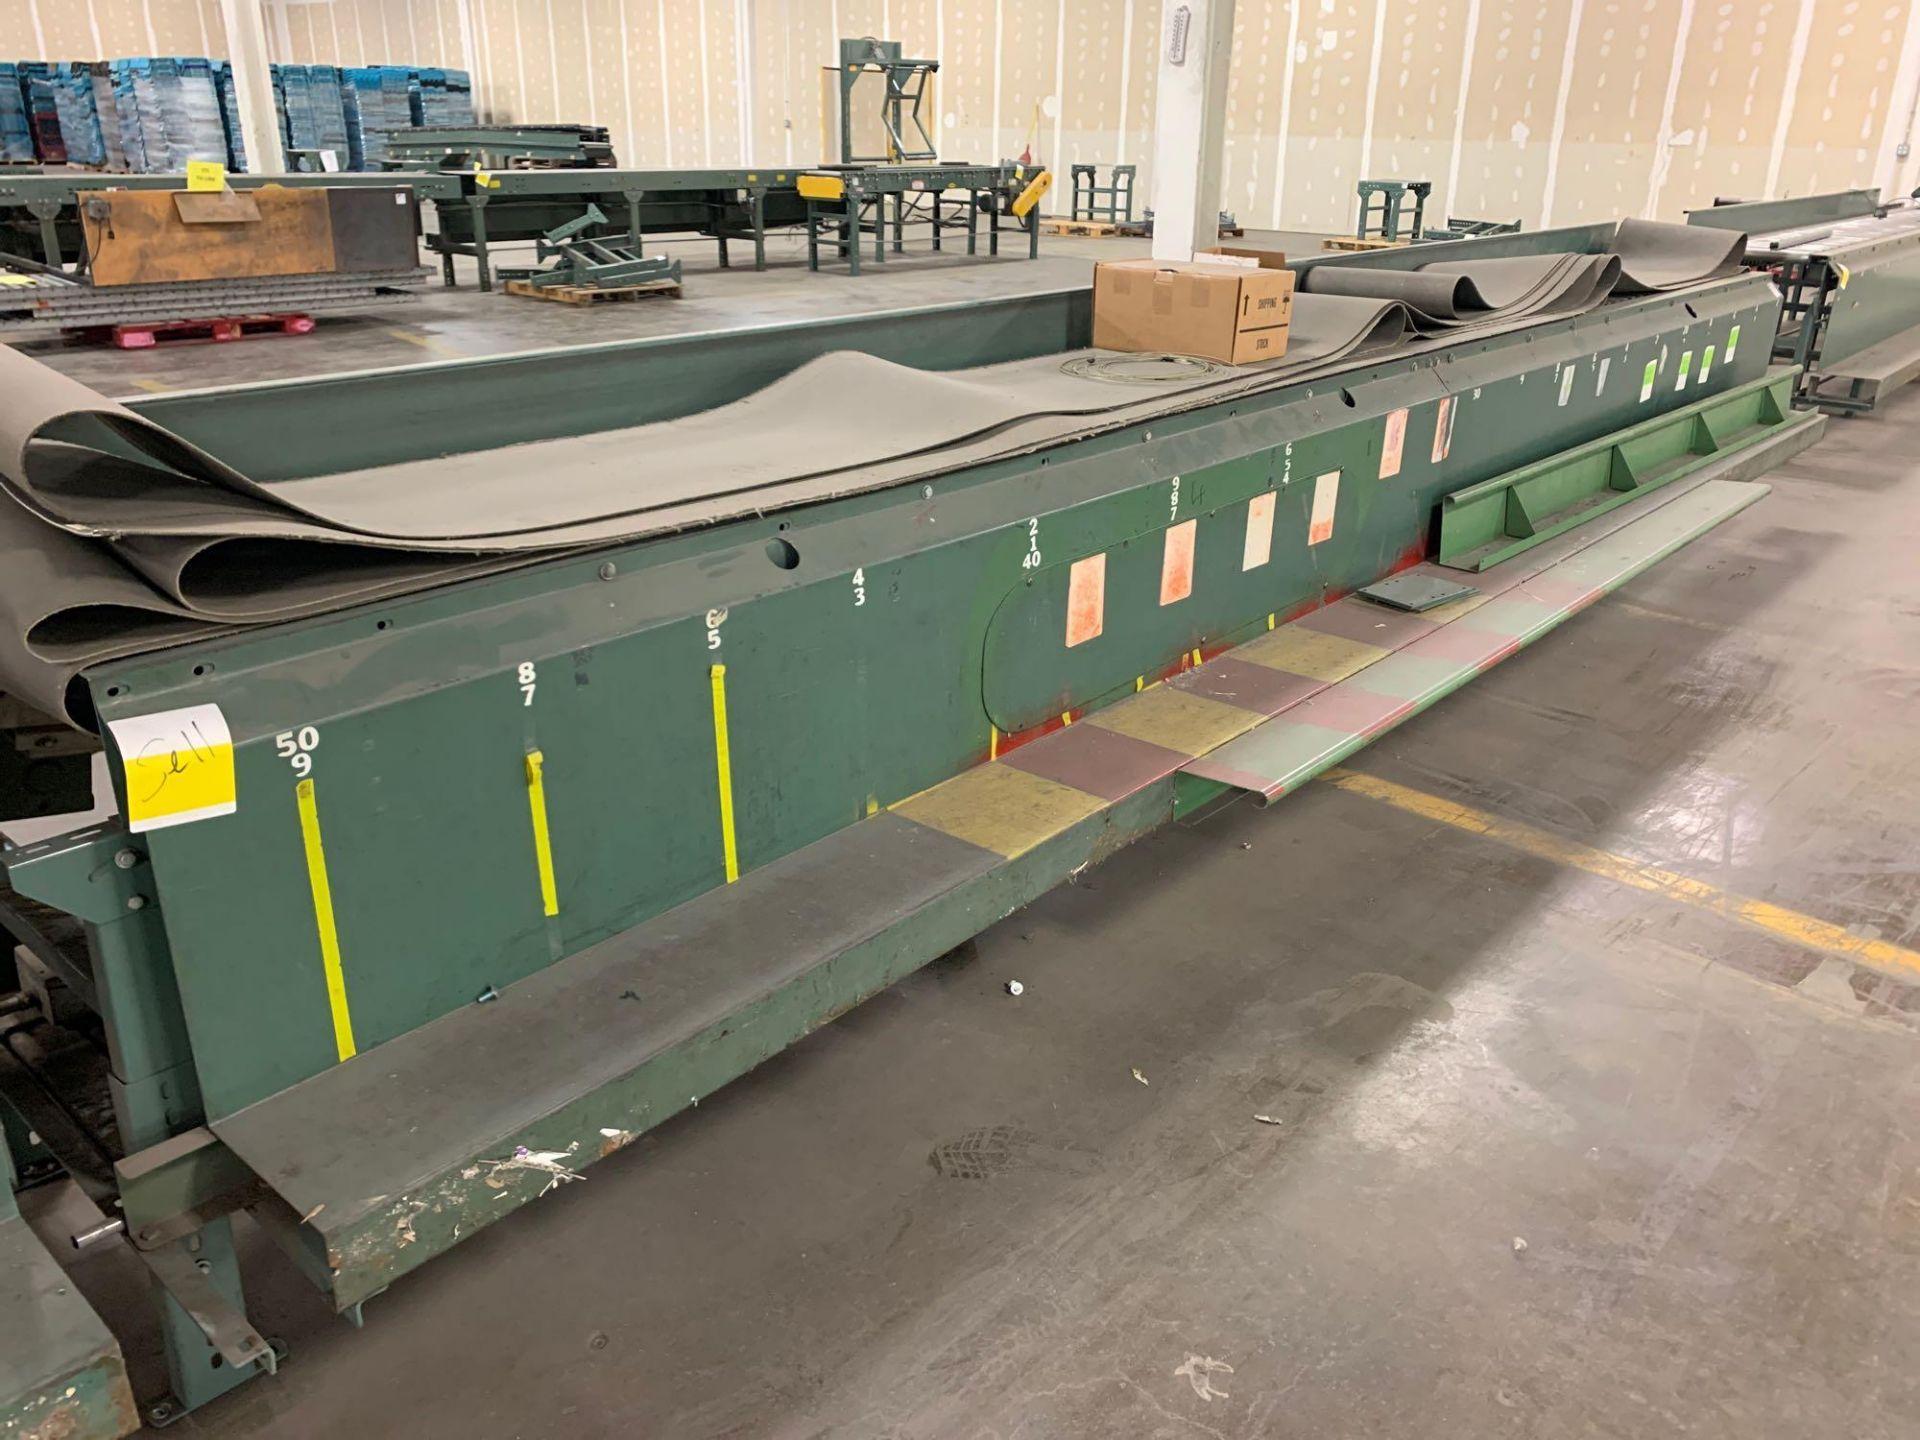 Hytrol 24' Conveyor Line Section